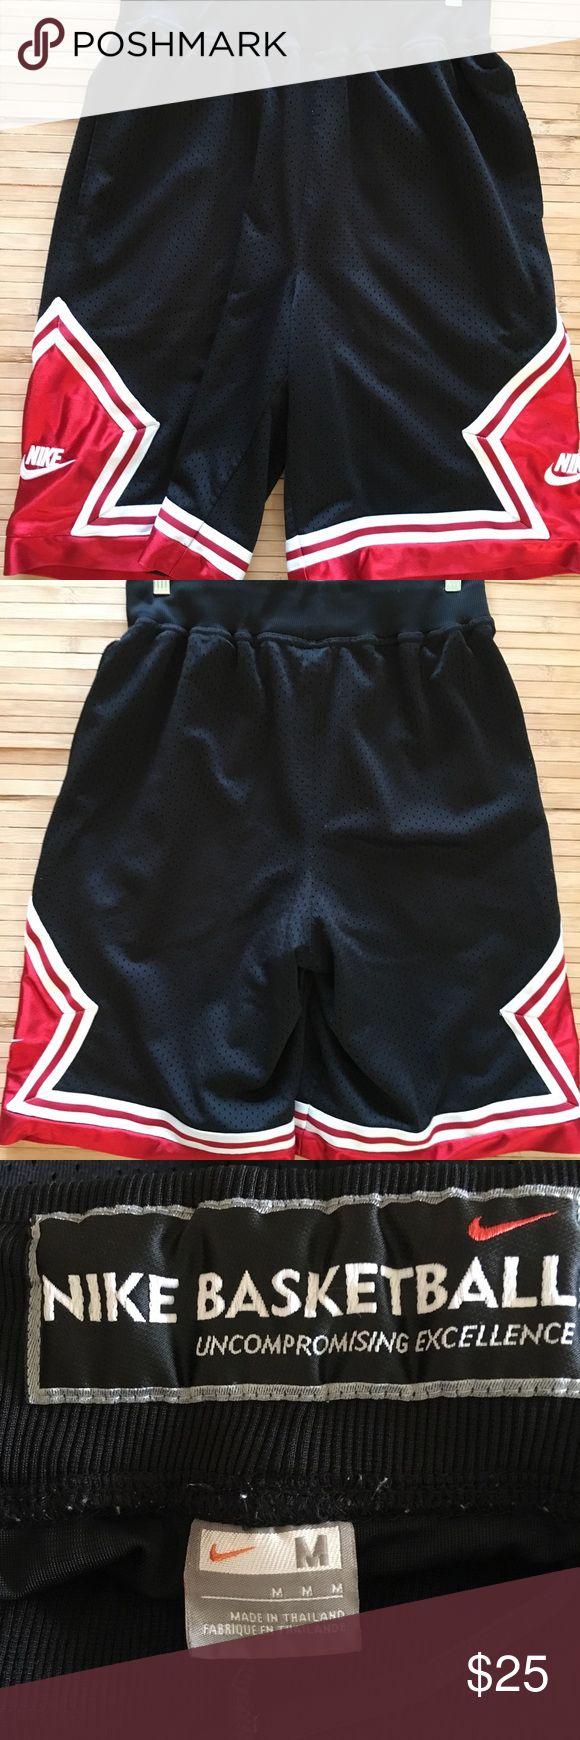 Nike Basketball Shorts Nike basketball uncompromising excellence. Like new. Nike Shorts Athletic